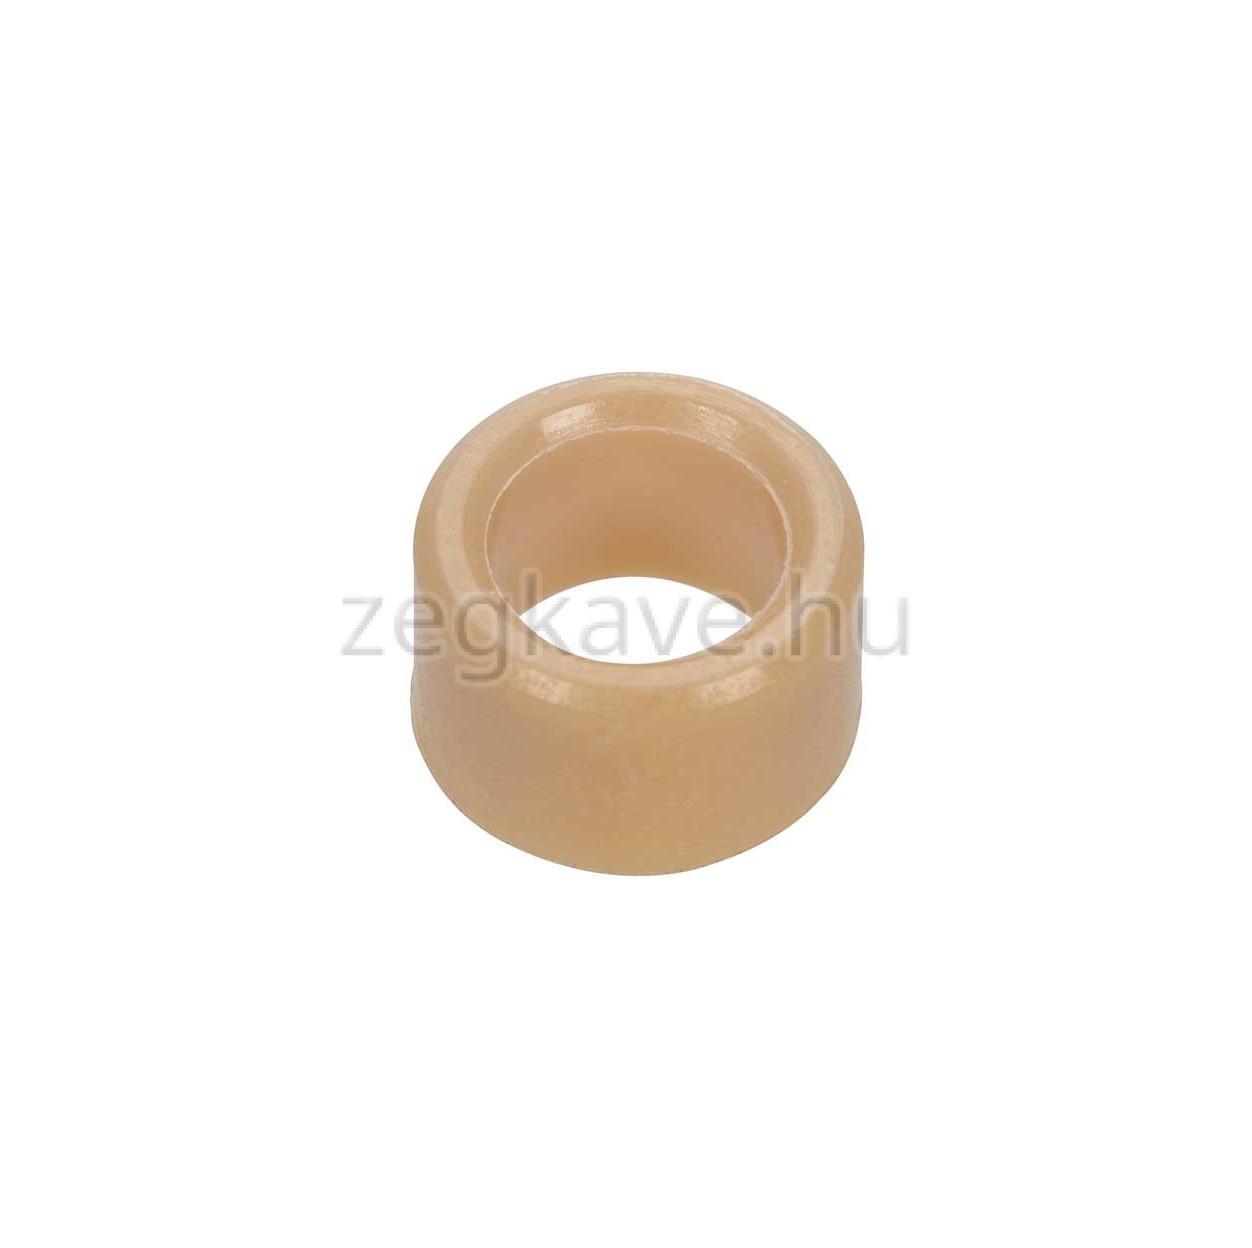 Delonghi boiler távtartó (5mm)